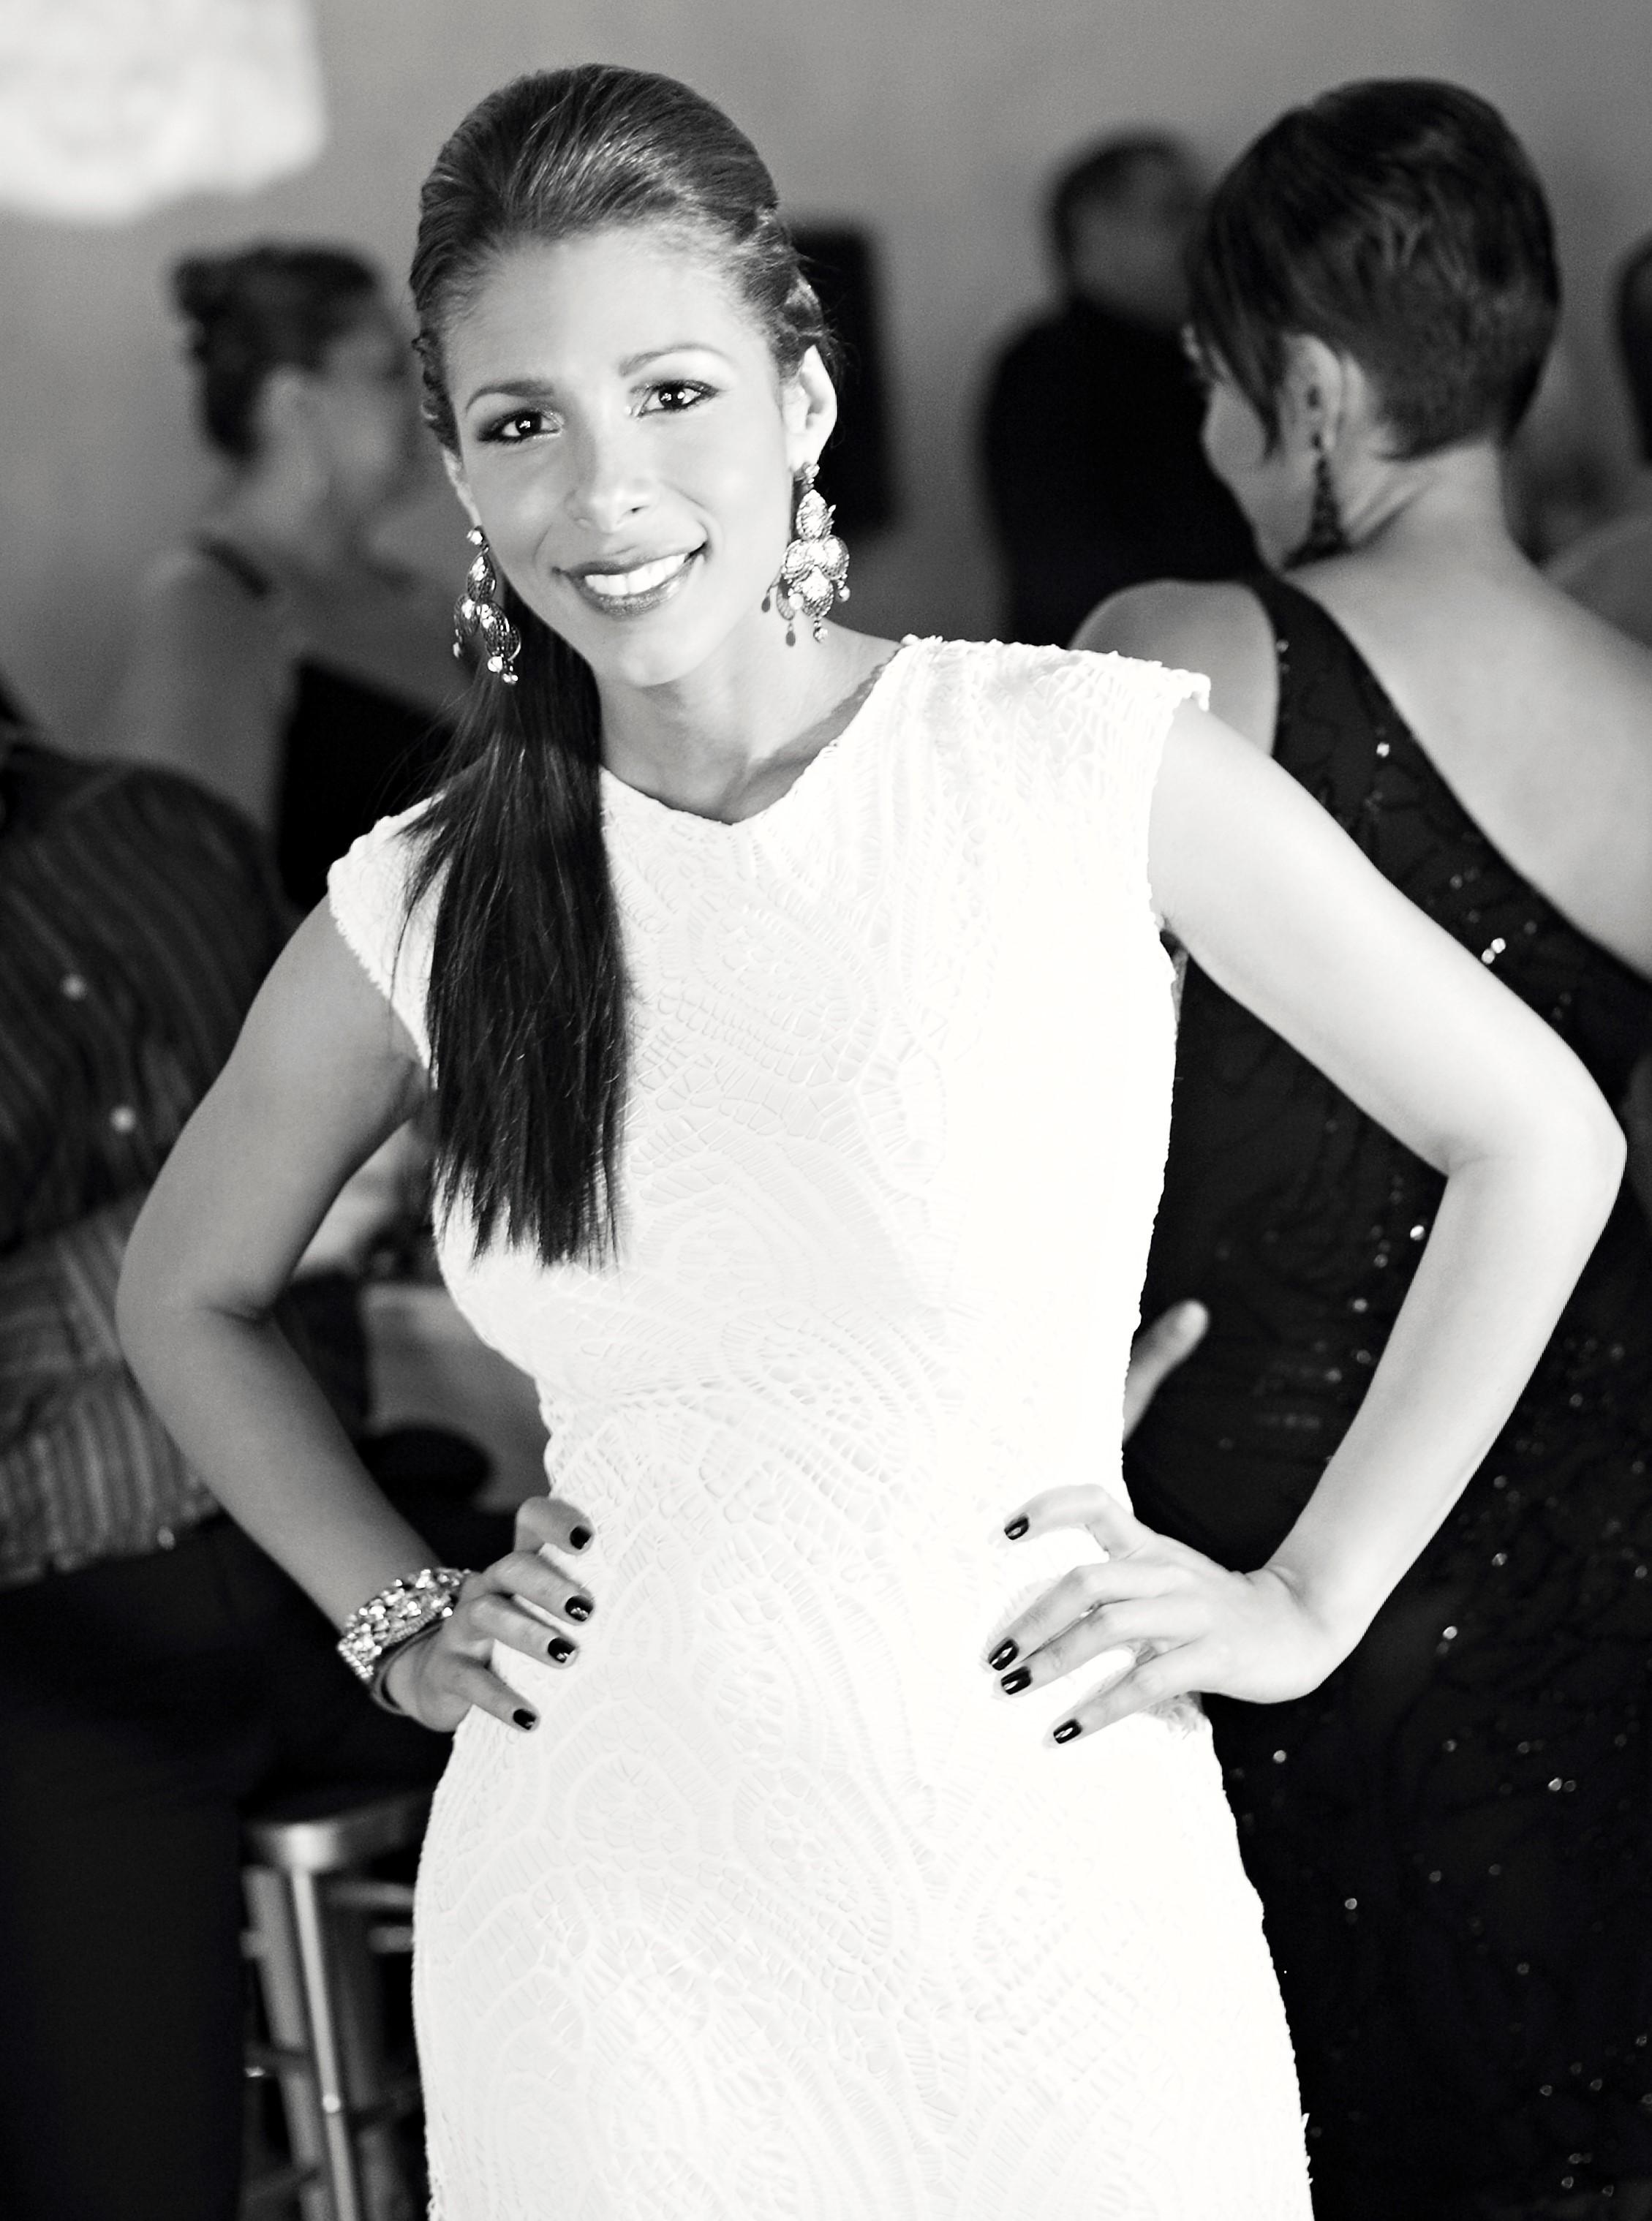 Alessandra Olivo, organizadora de bodas de lujo